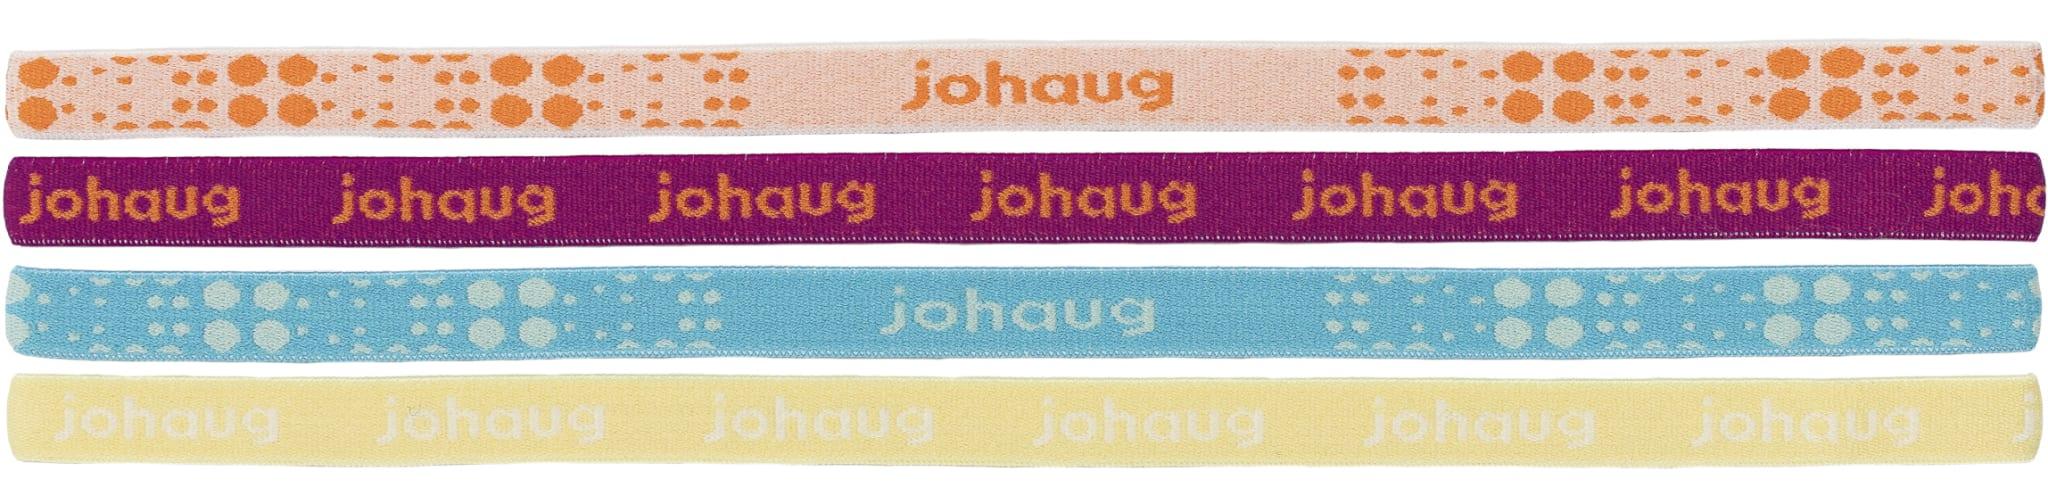 Johaug Hairband 4pk